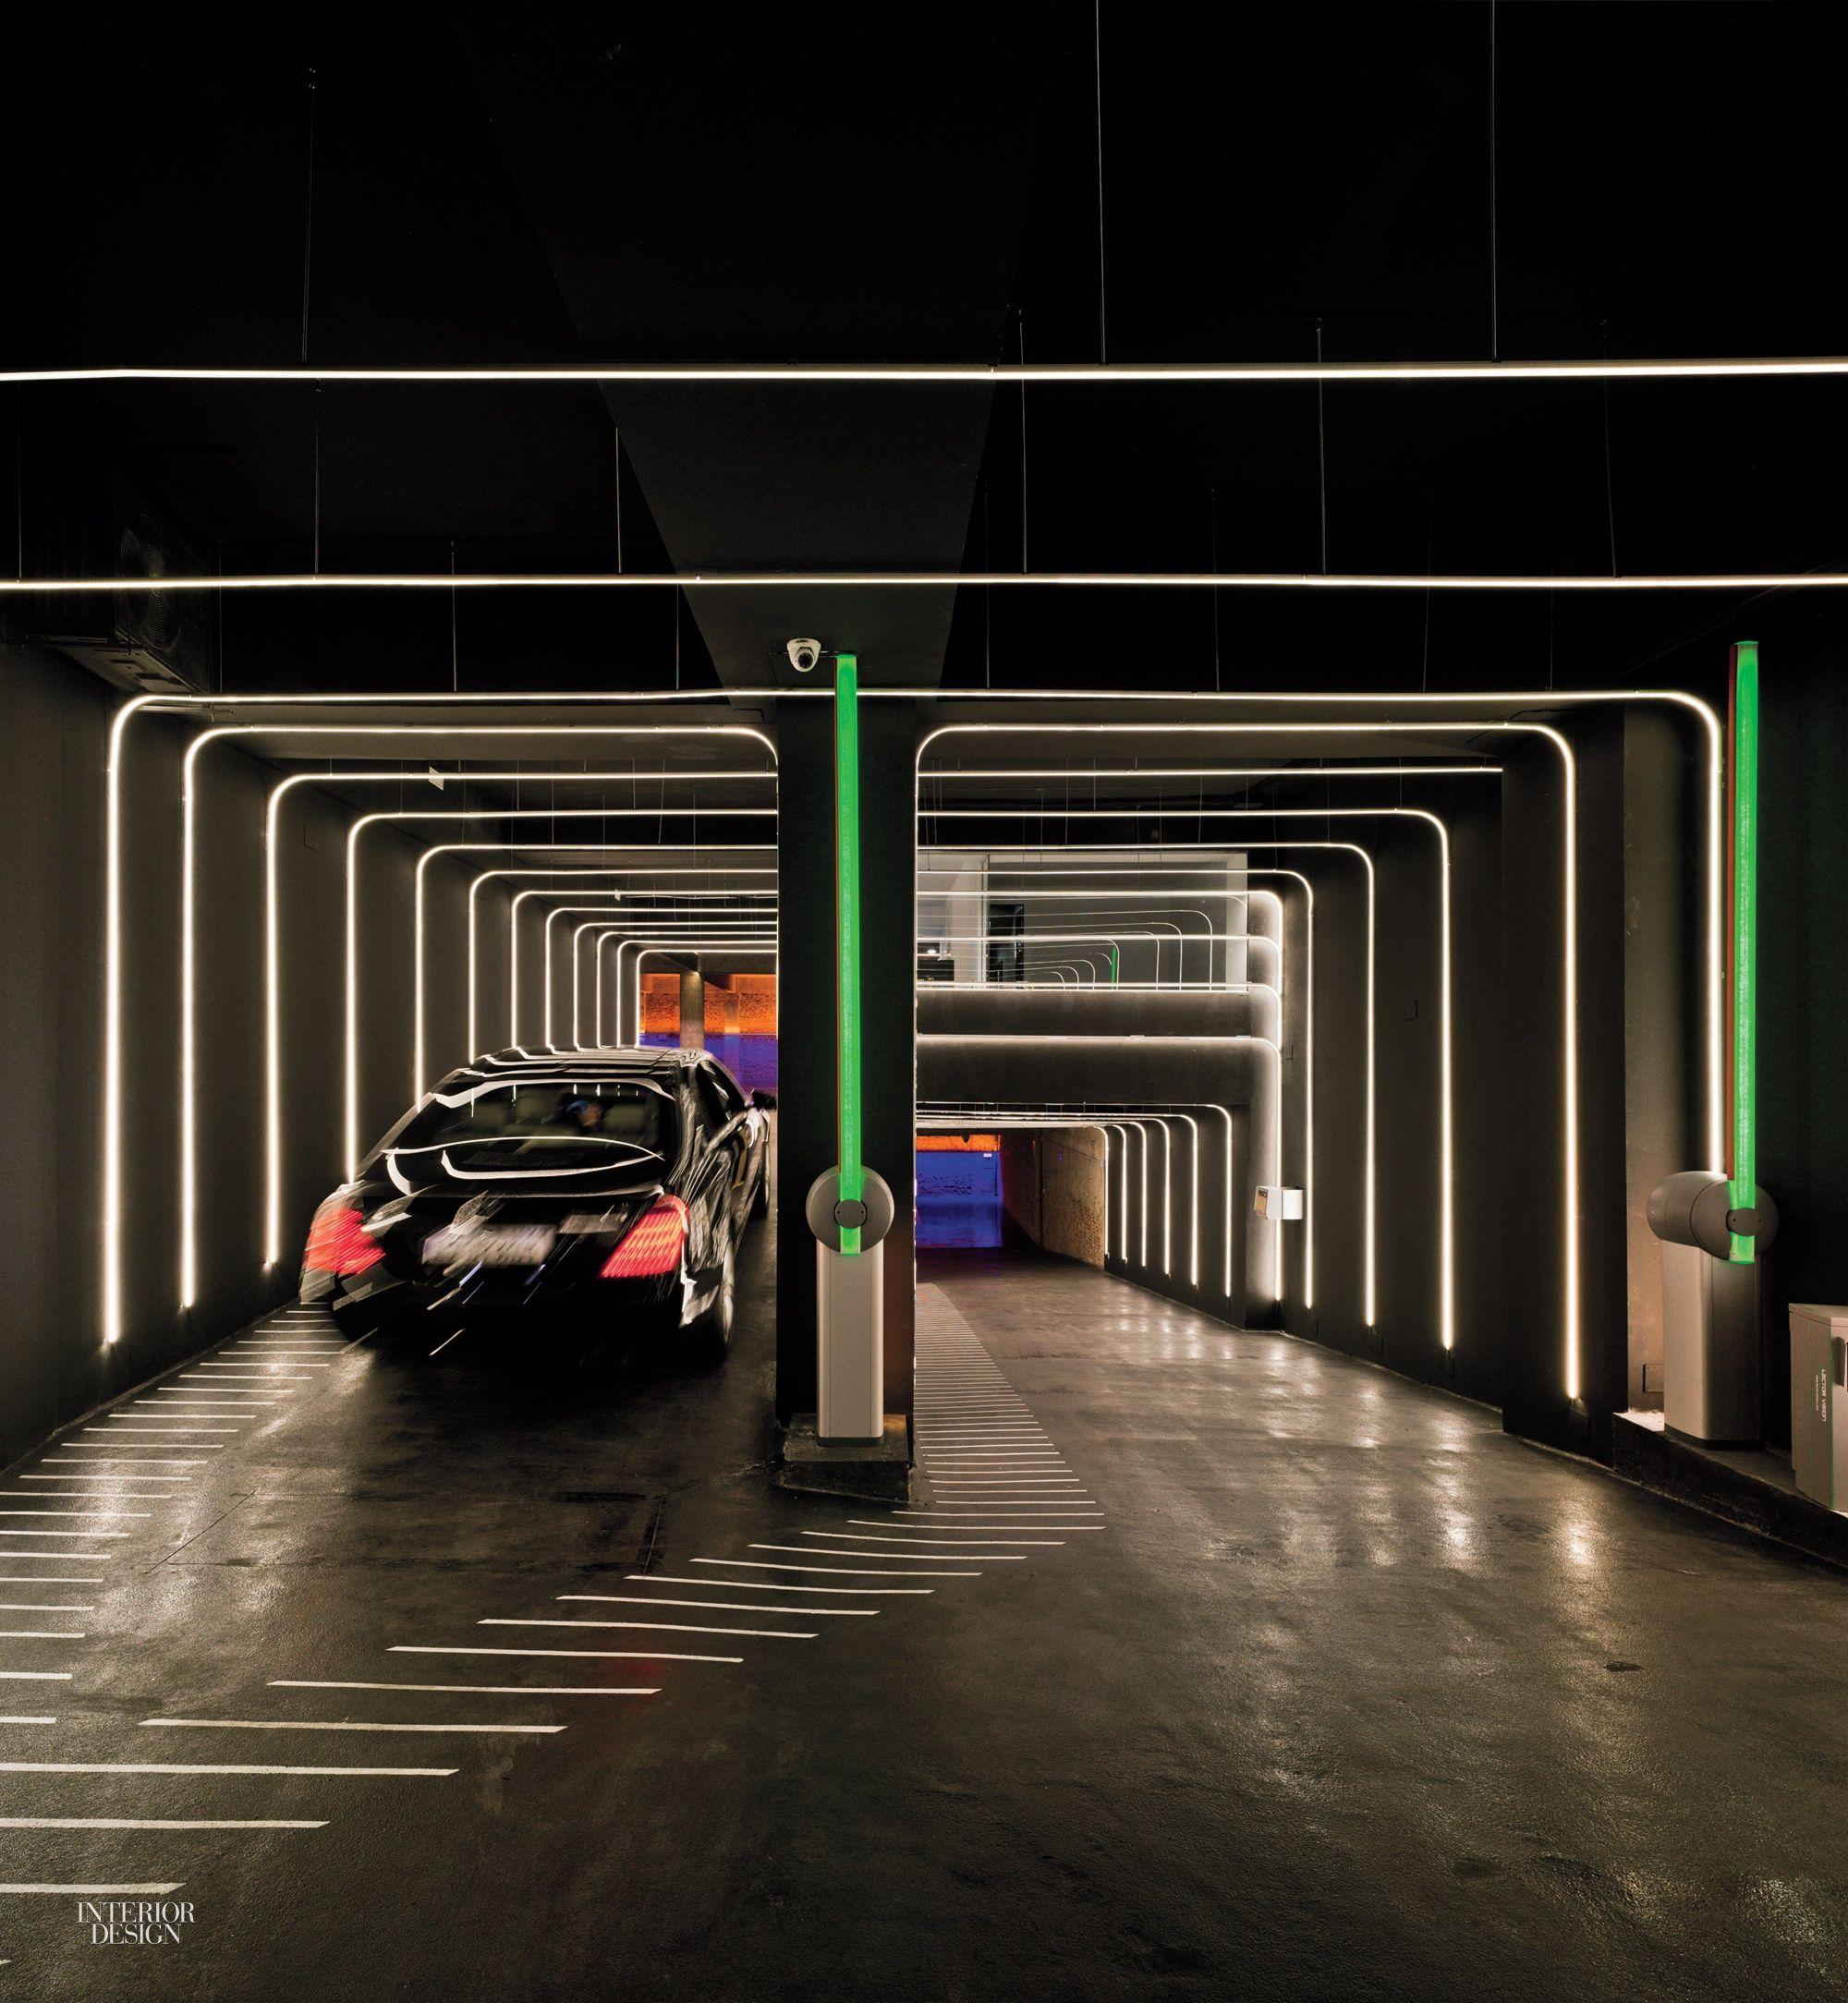 Pin By Tin Wong On Car Park Lighting Design Interior Garage Design Interior Parking Design